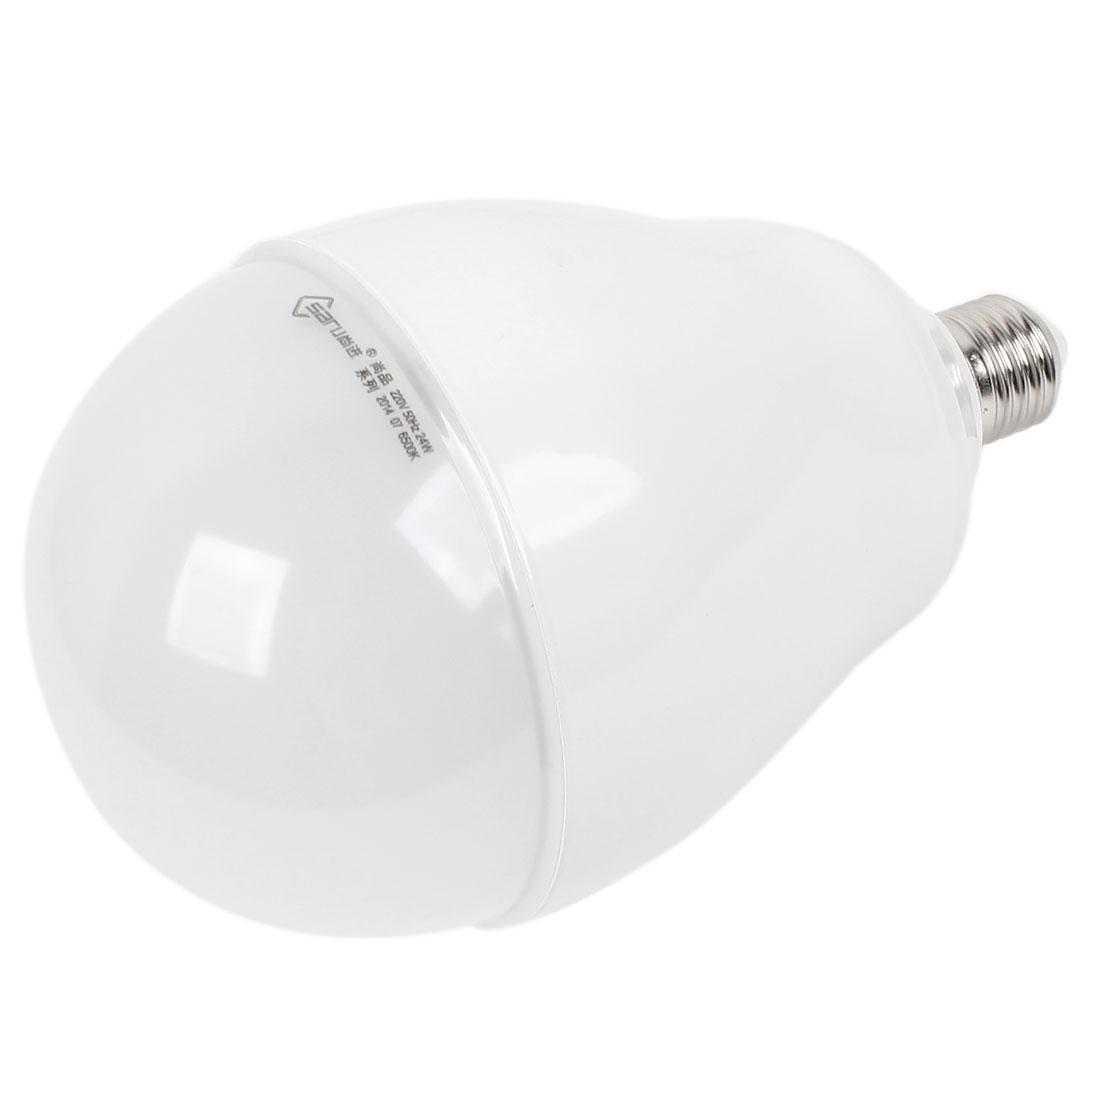 Home E27 Energy Saving LED Globe Ball White Light Lamp Bulb AC 200V-240V 24W